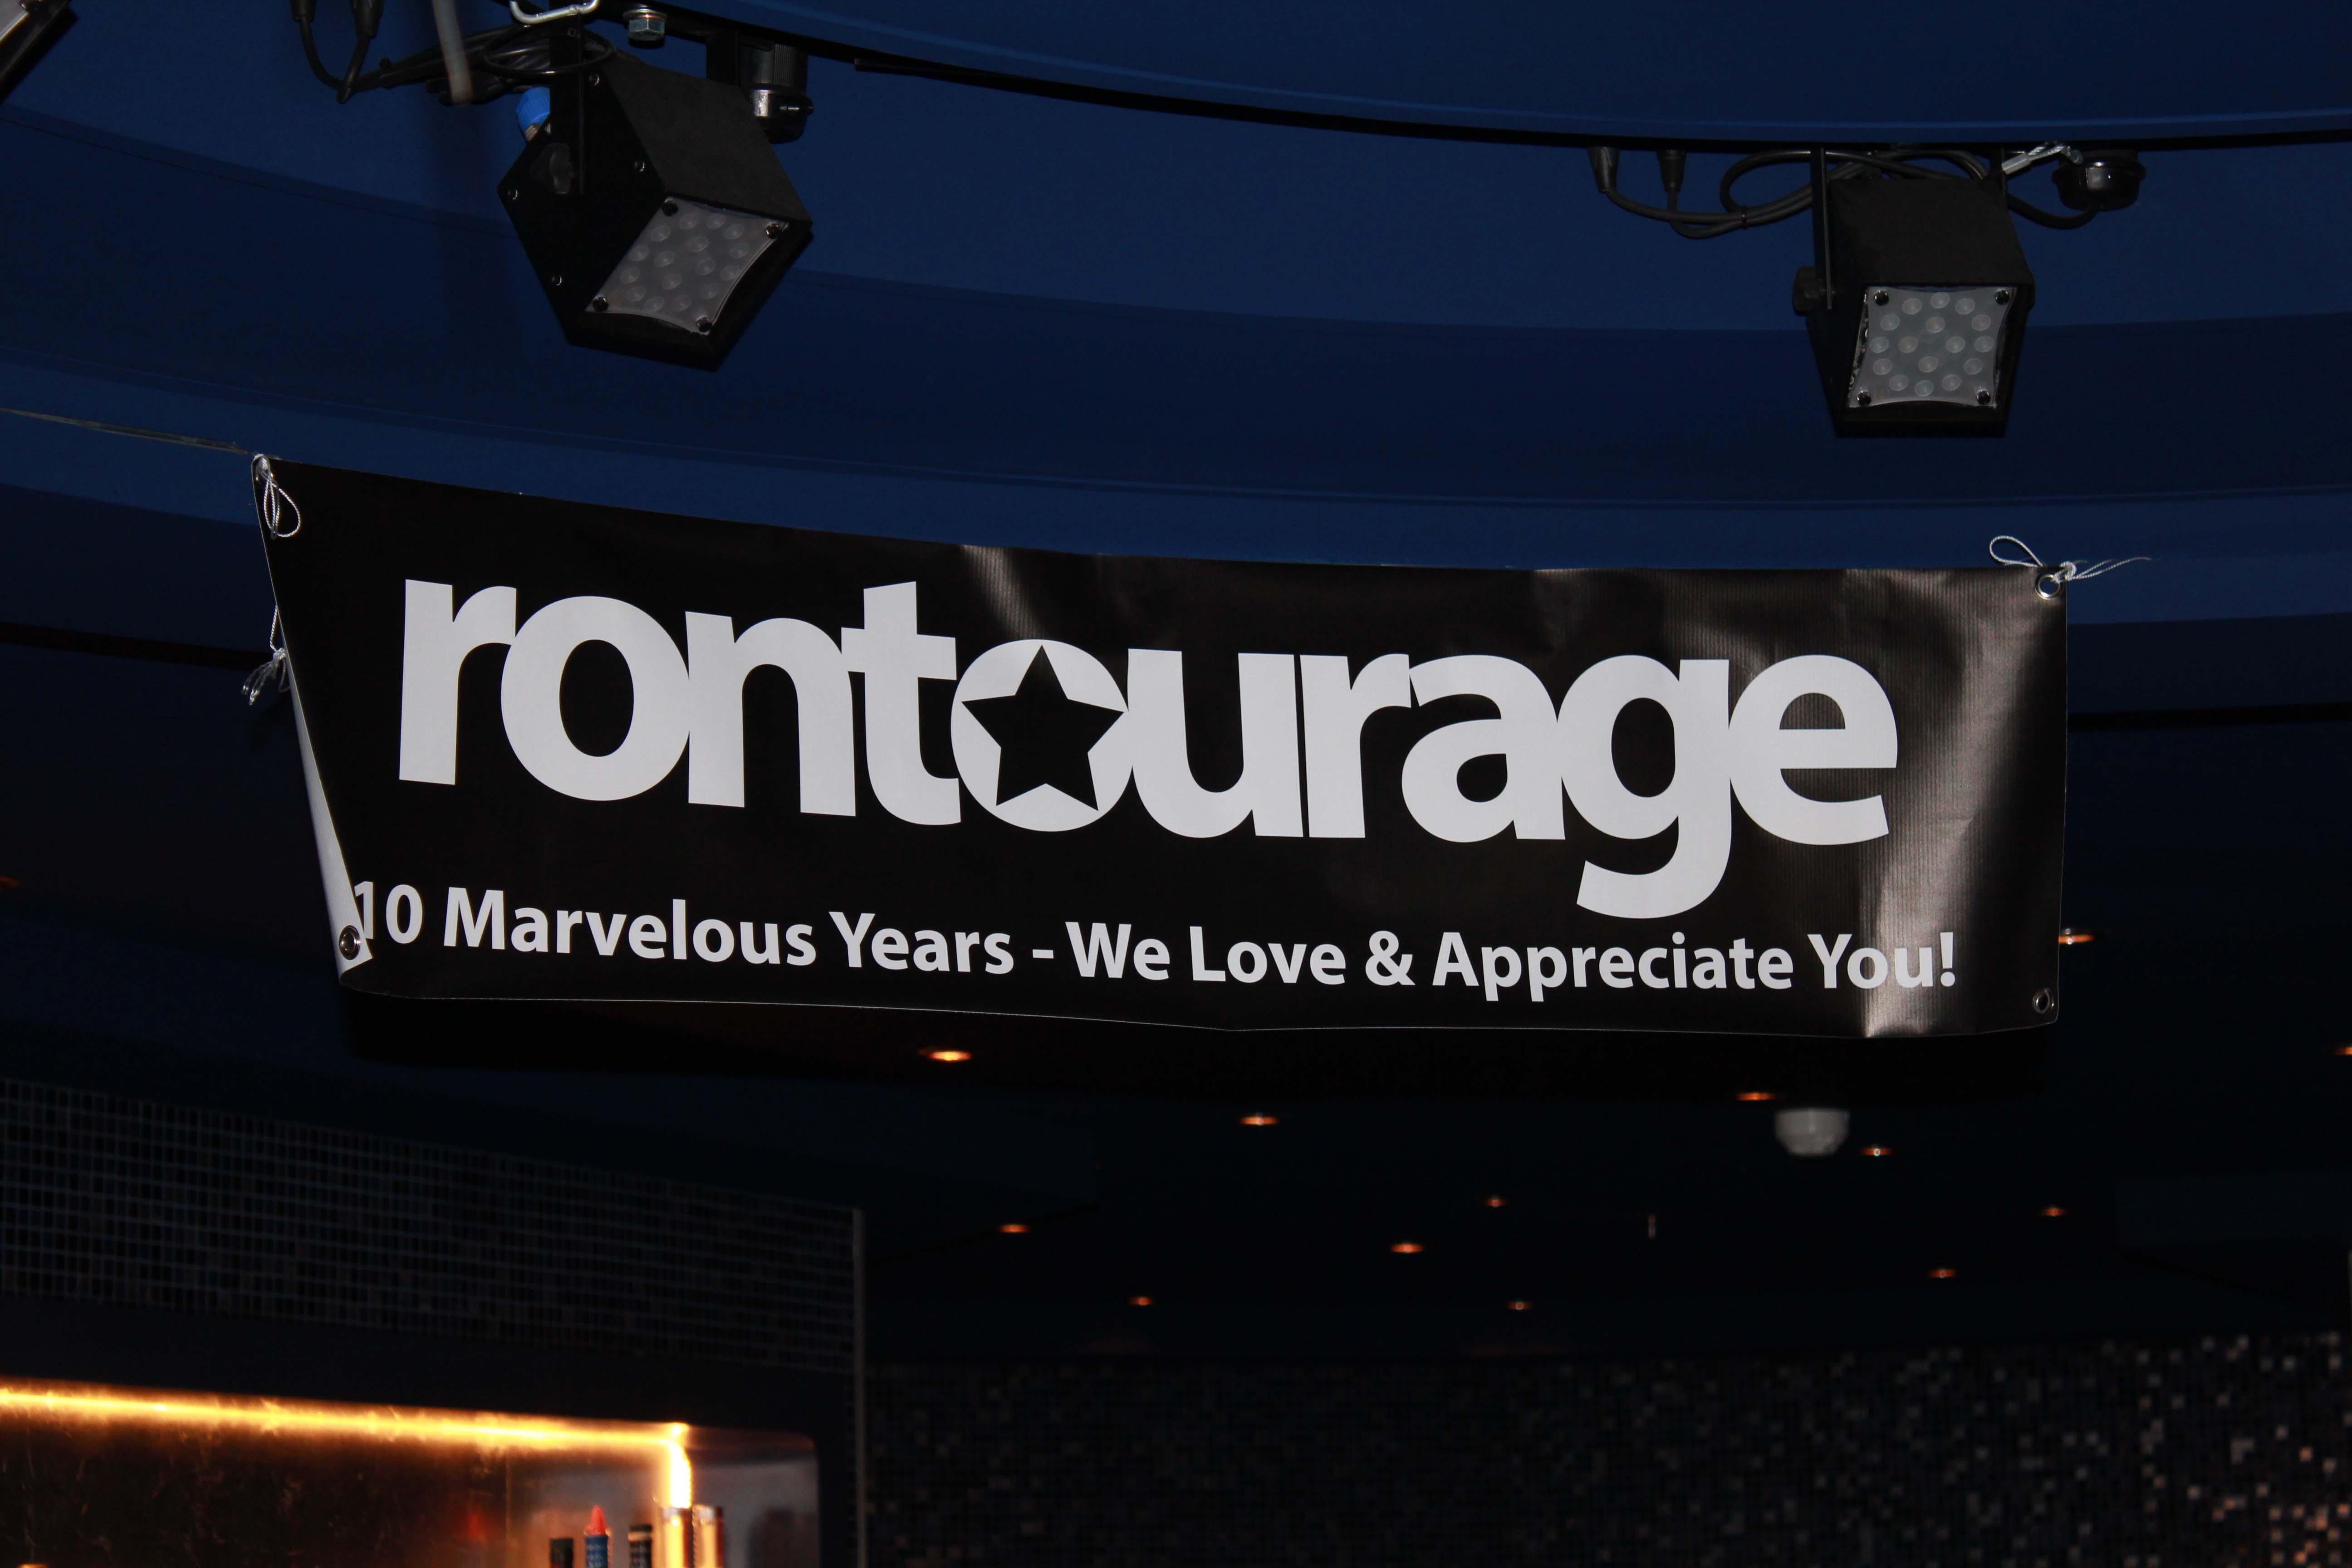 Rontourage Sign